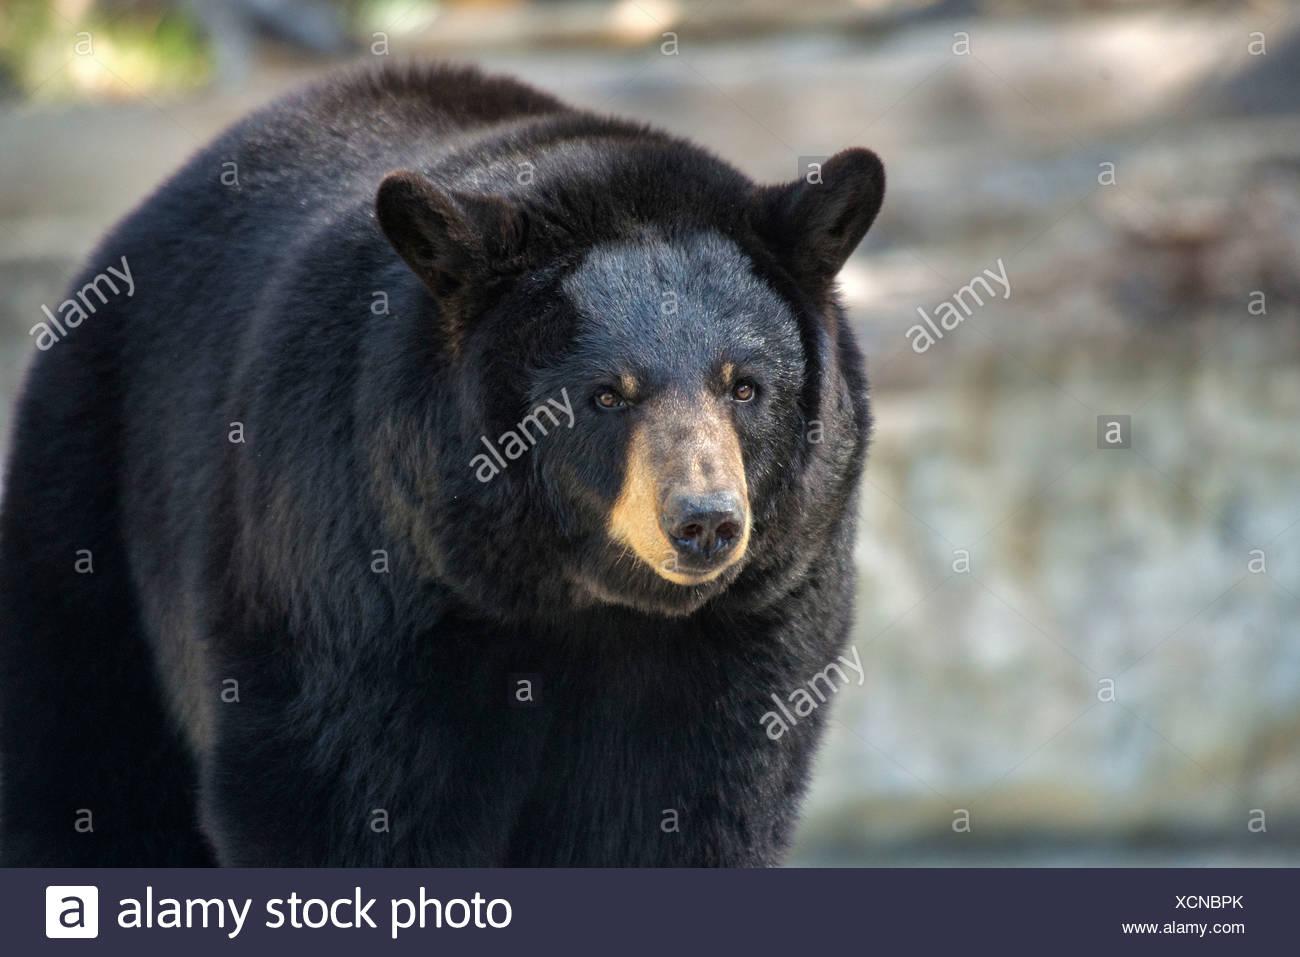 black bear, ursus americanus, bear, animal, USA, United States, America, Stock Photo